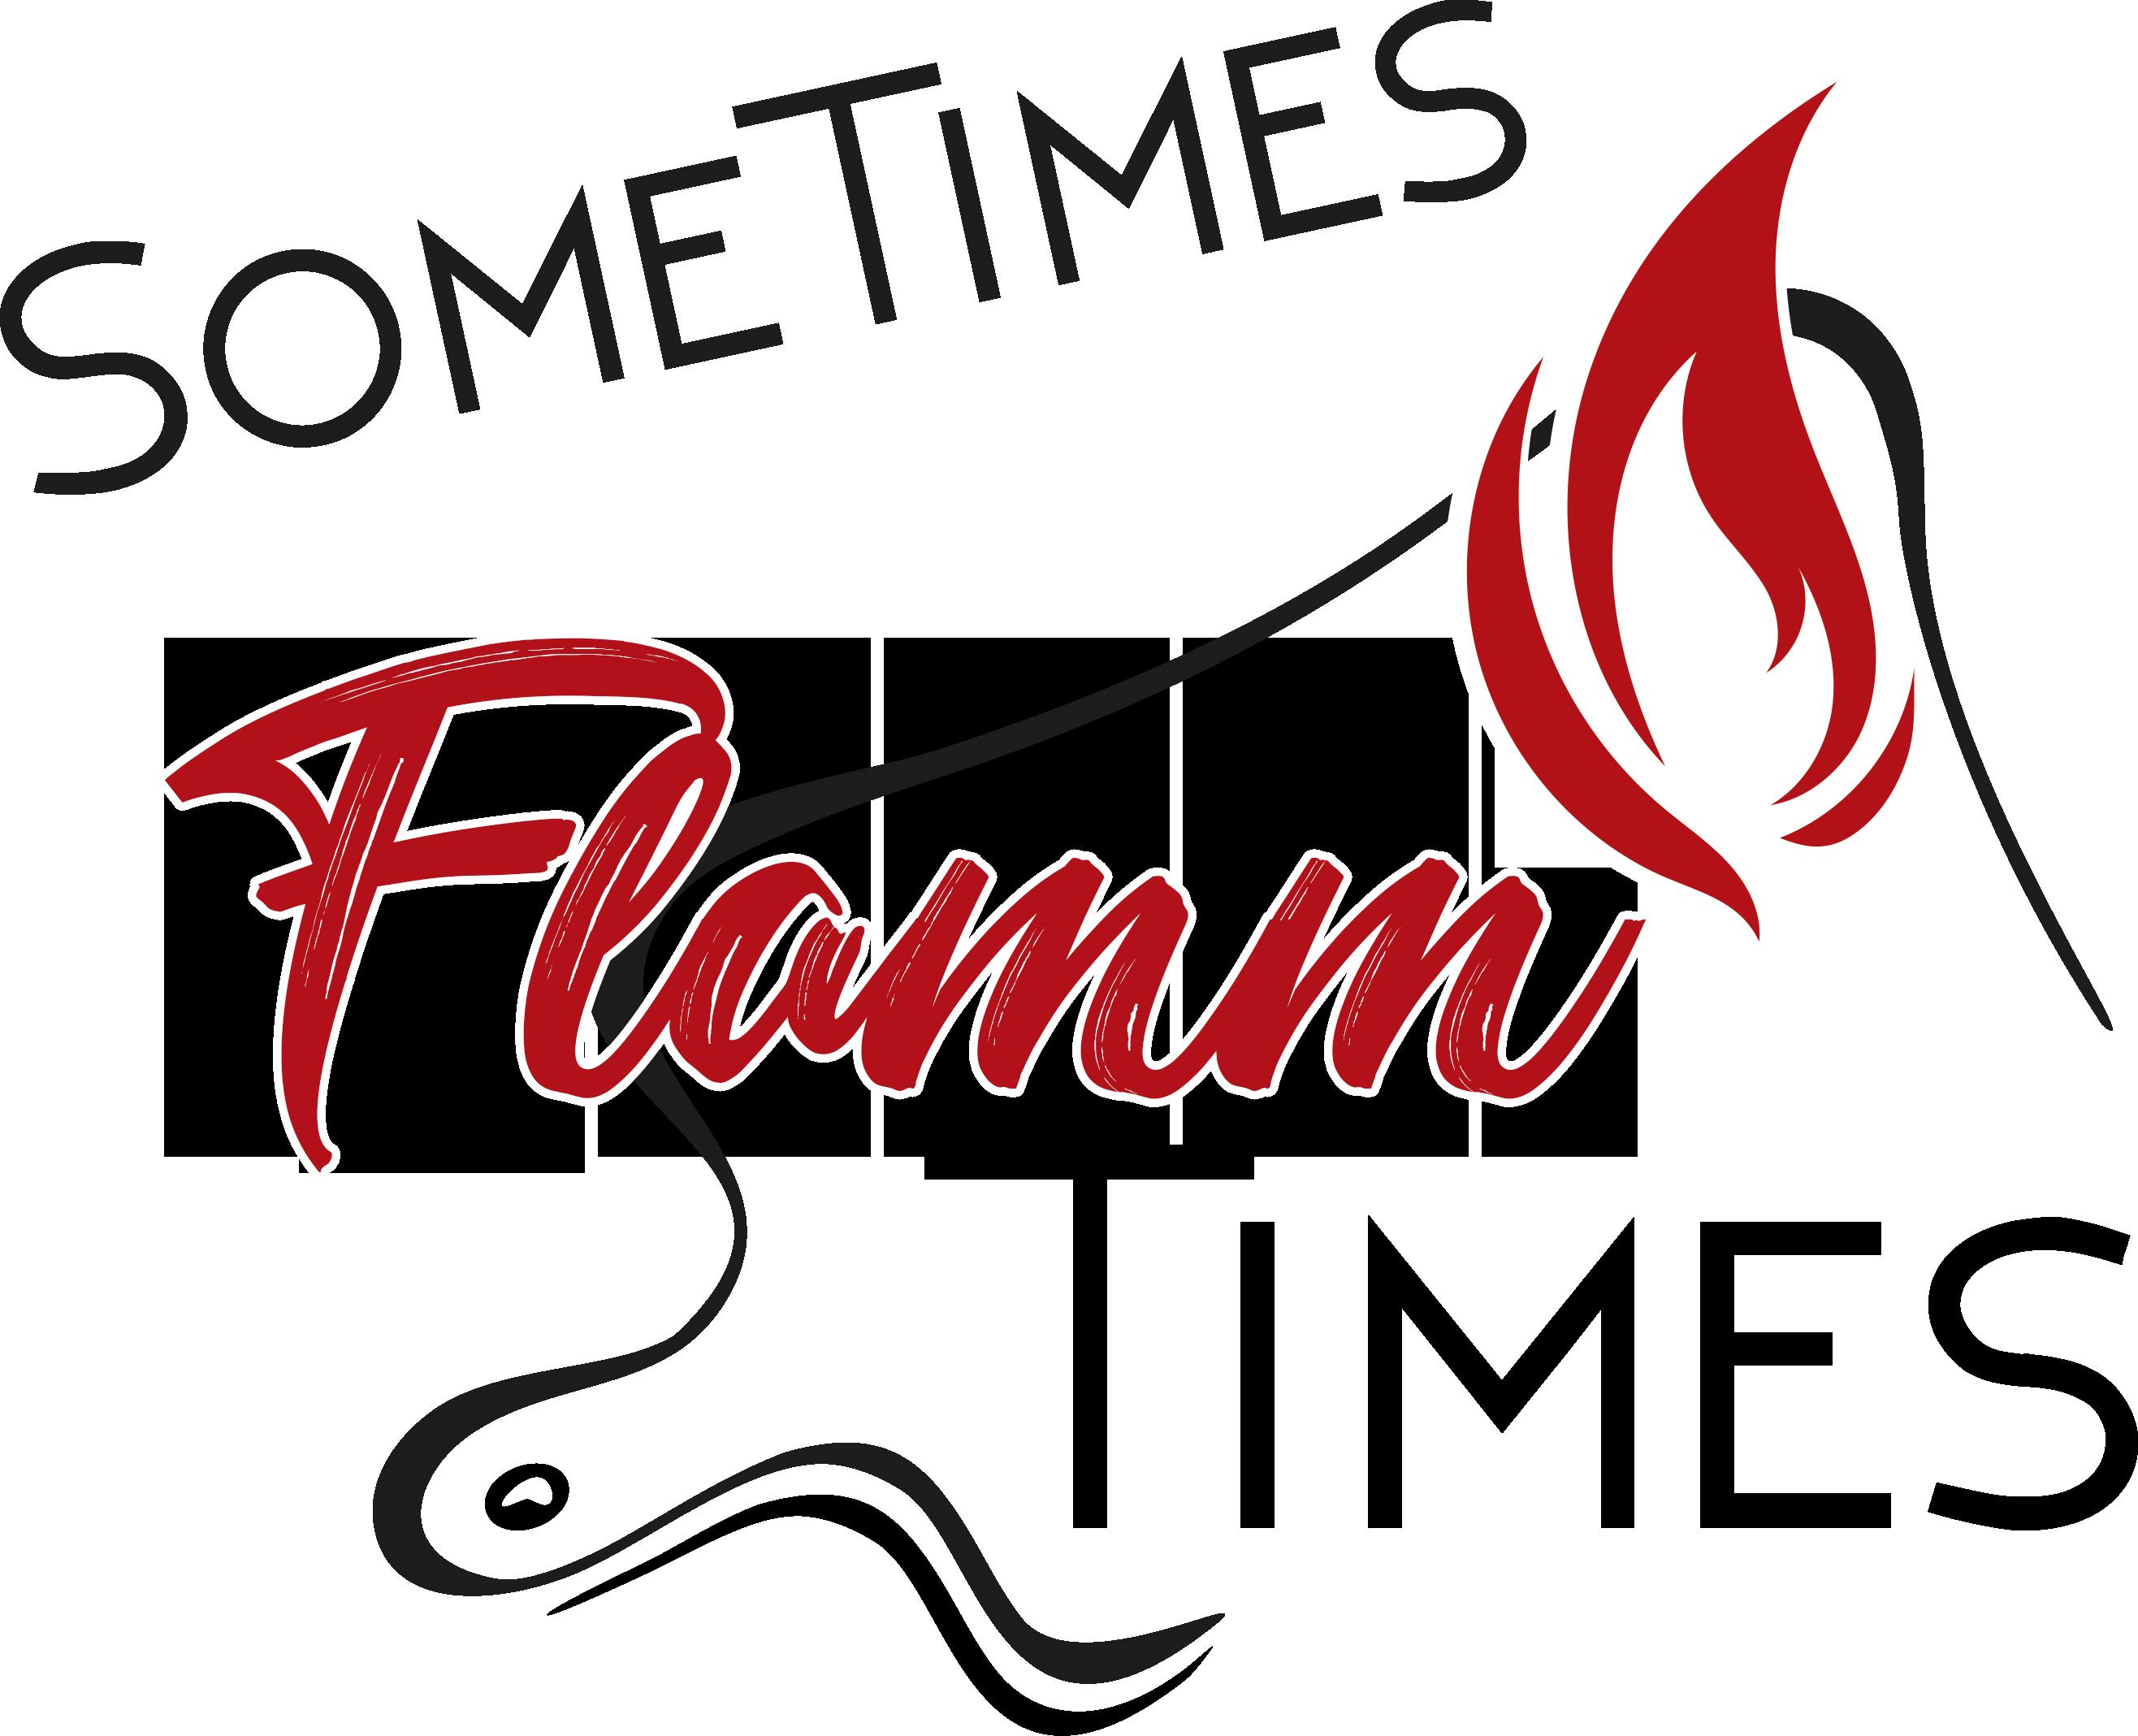 Restaurant FlammTimes Sonthofen